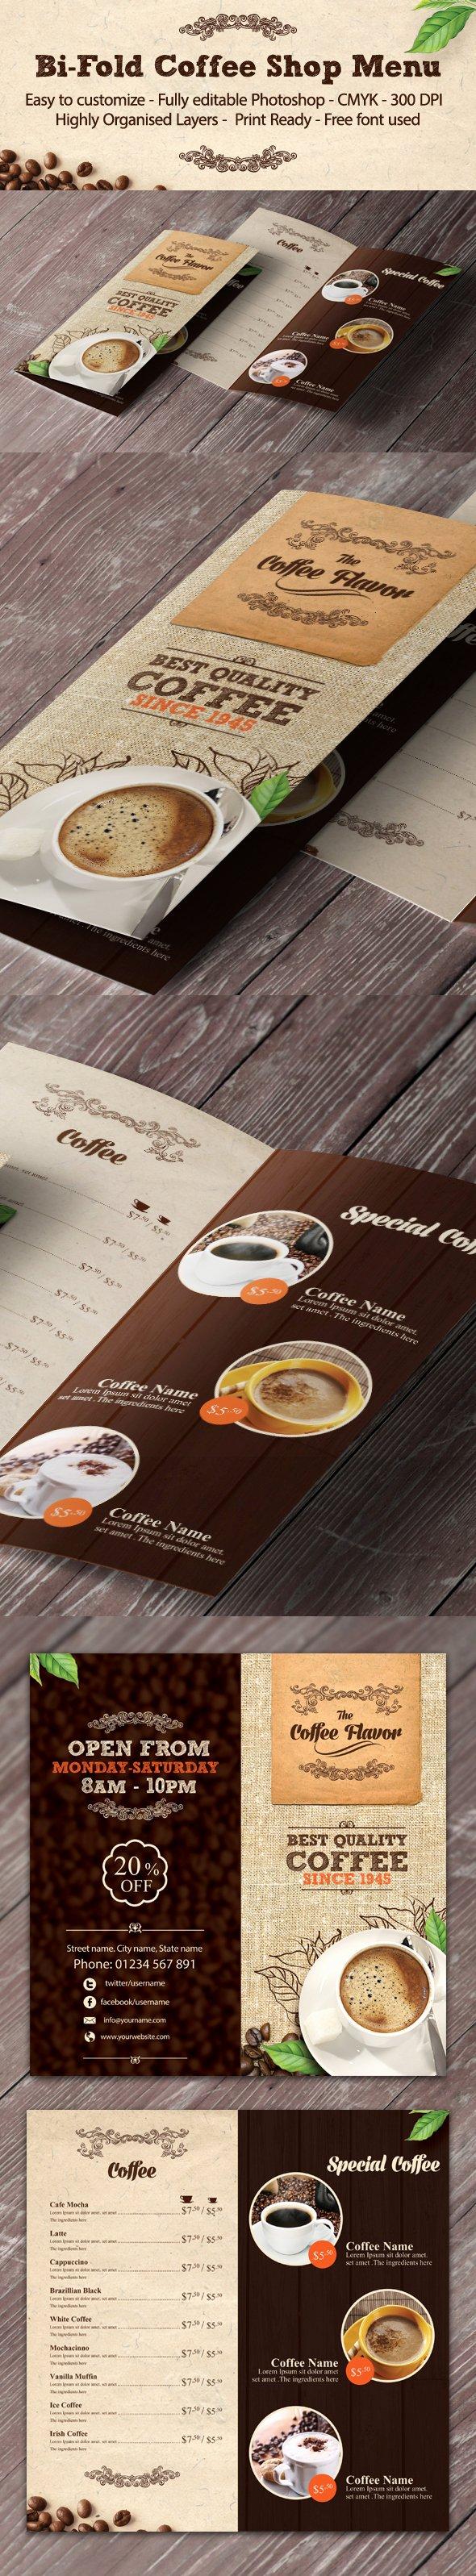 Bi Fold Menu Template Fresh Bi Fold Coffee Shop Menu Template On Behance